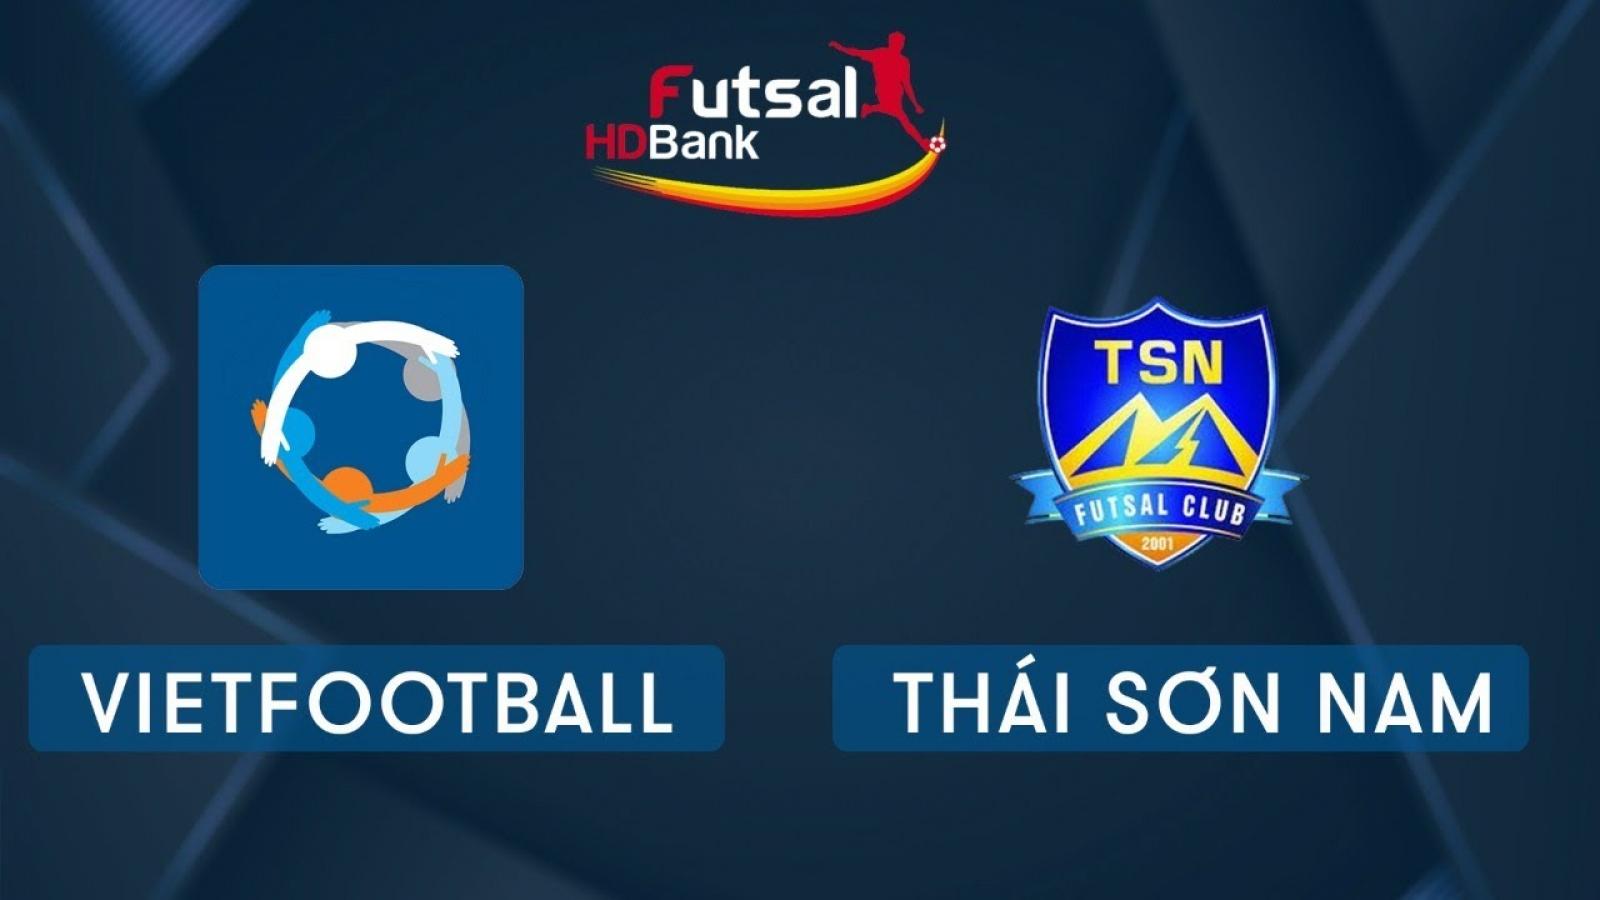 Xem trực tiếp Futsal HDBank VĐQG 2020: Vietfootball - Thái Sơn Nam